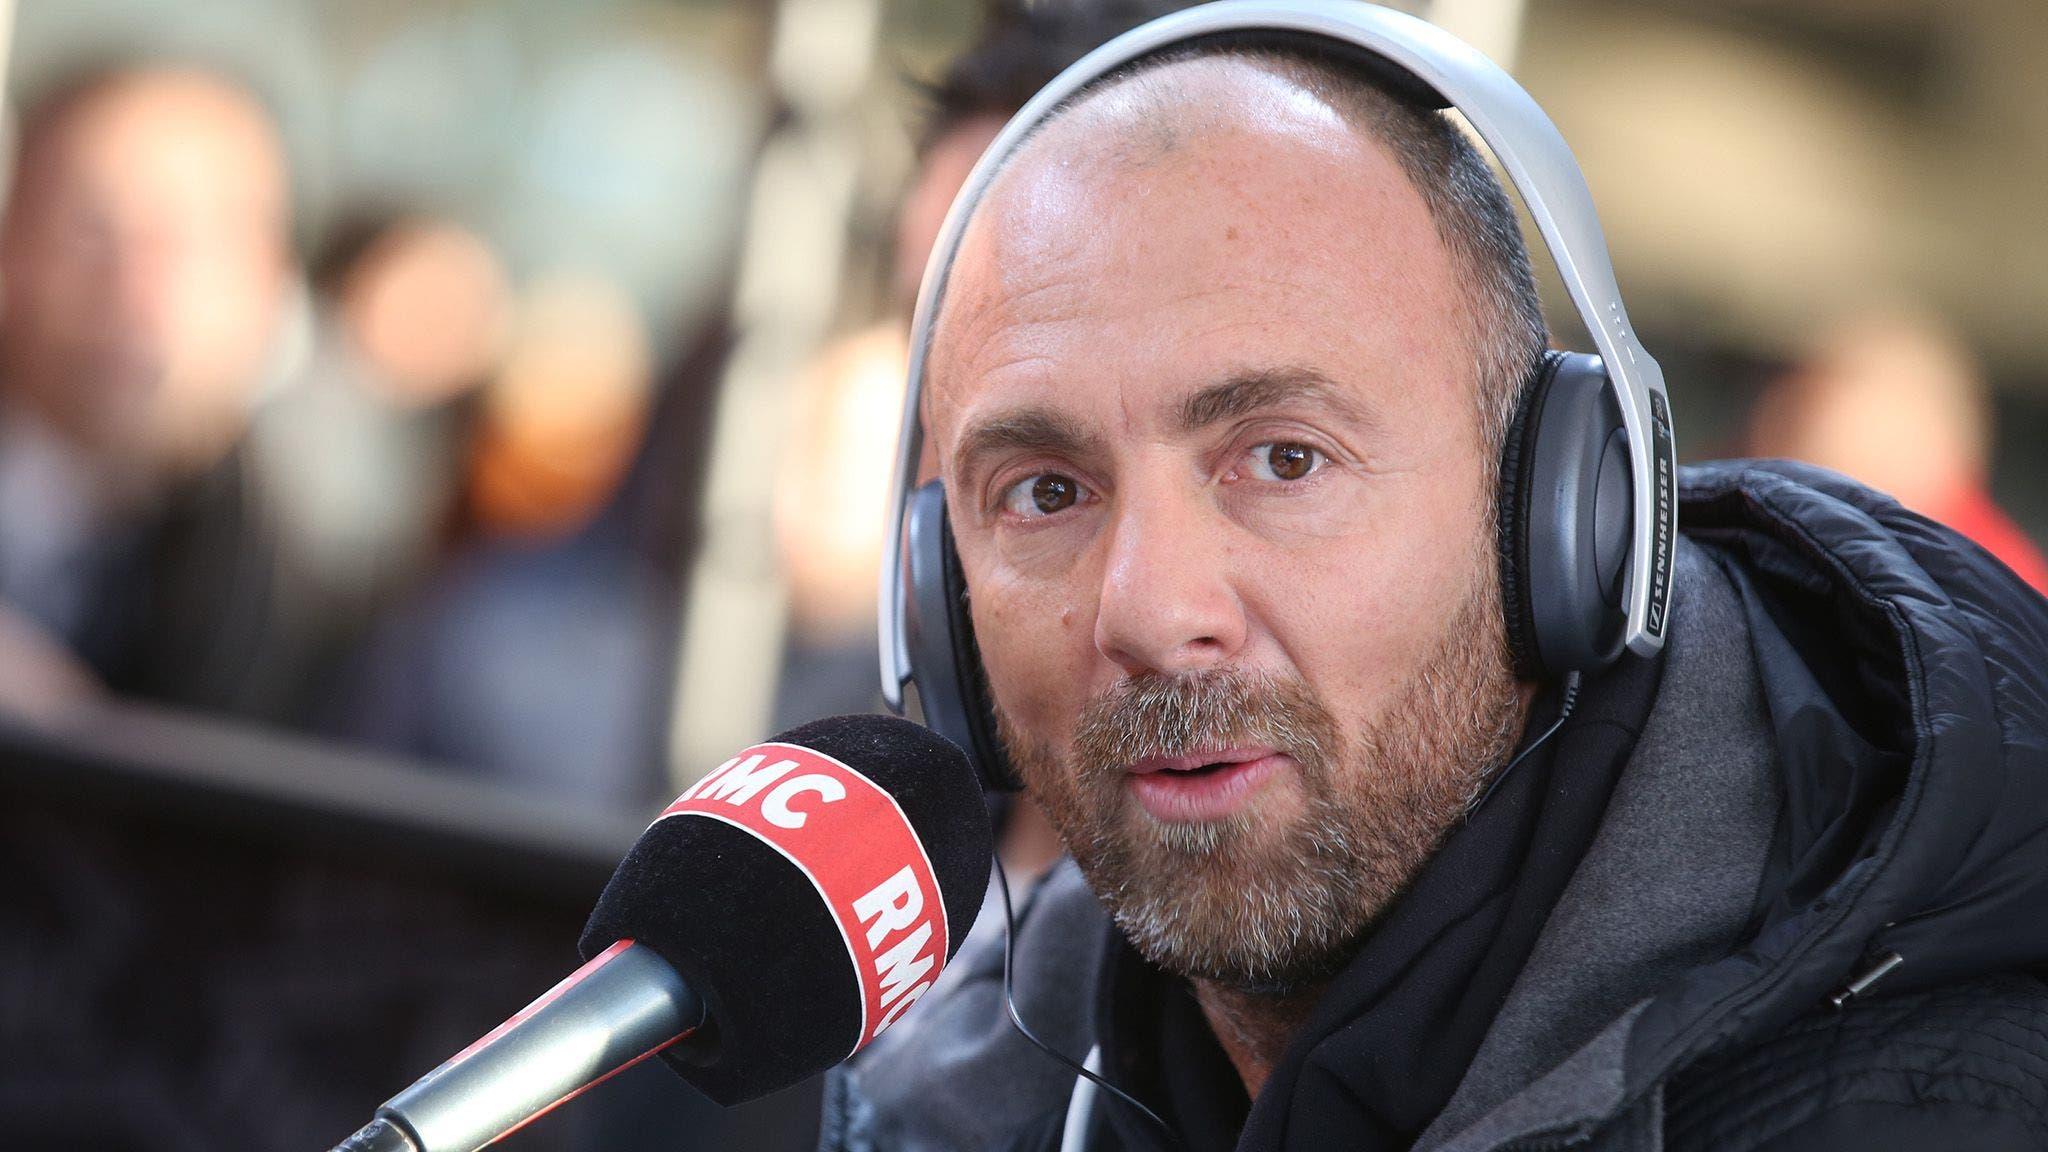 دوغاري مقدم برنامج فريق دوغا الإذاعي على راديو مونتي كارلو